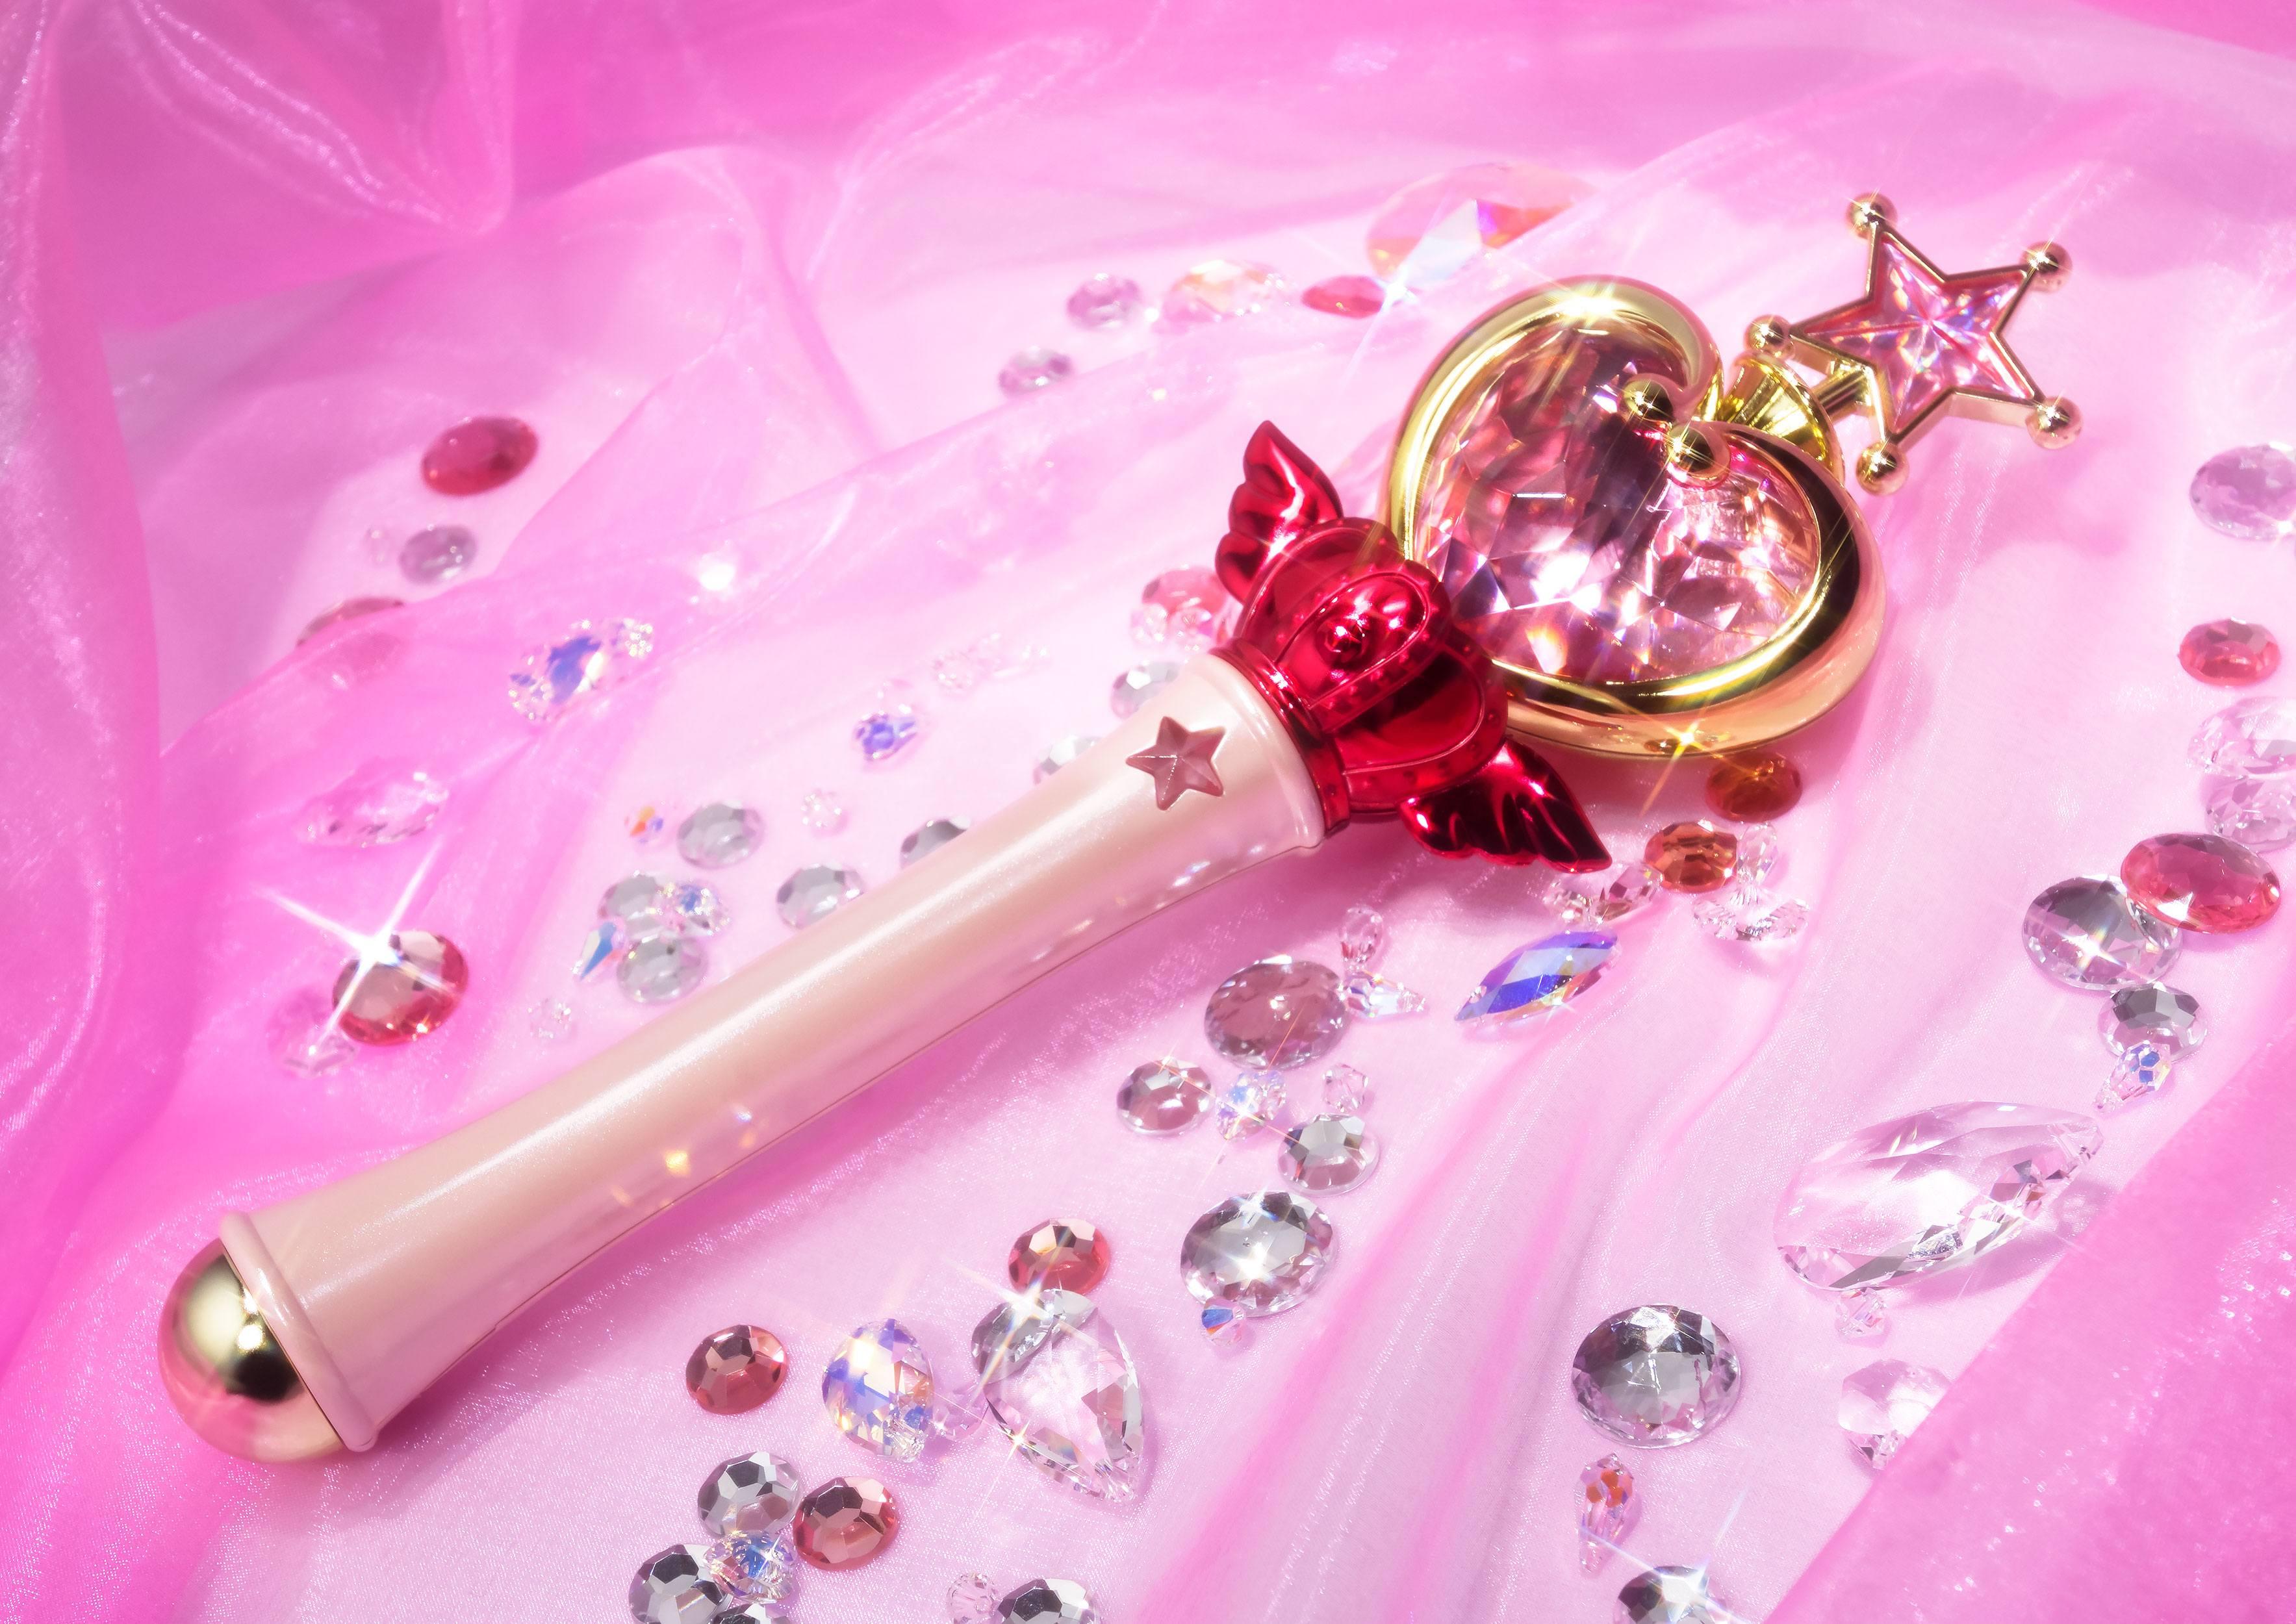 Sailor Moon Proplica Prop Pink Moon Stick Bandai Tamashii Web Exclusive 27cm